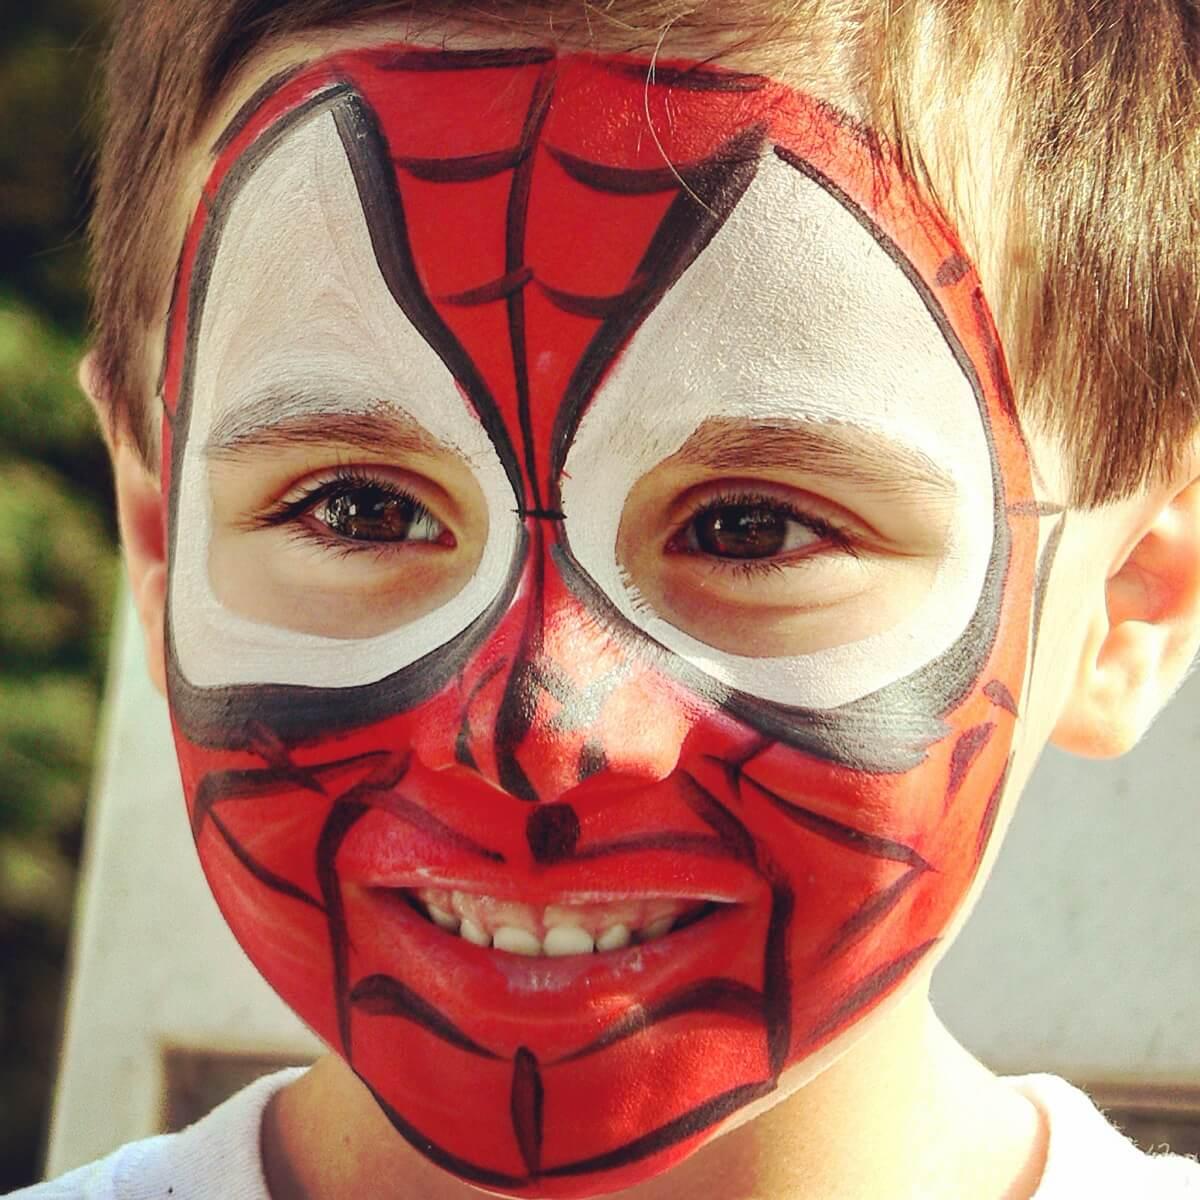 DIY Face Paint Ideas for Kids - Superhero Face Paint for Boys